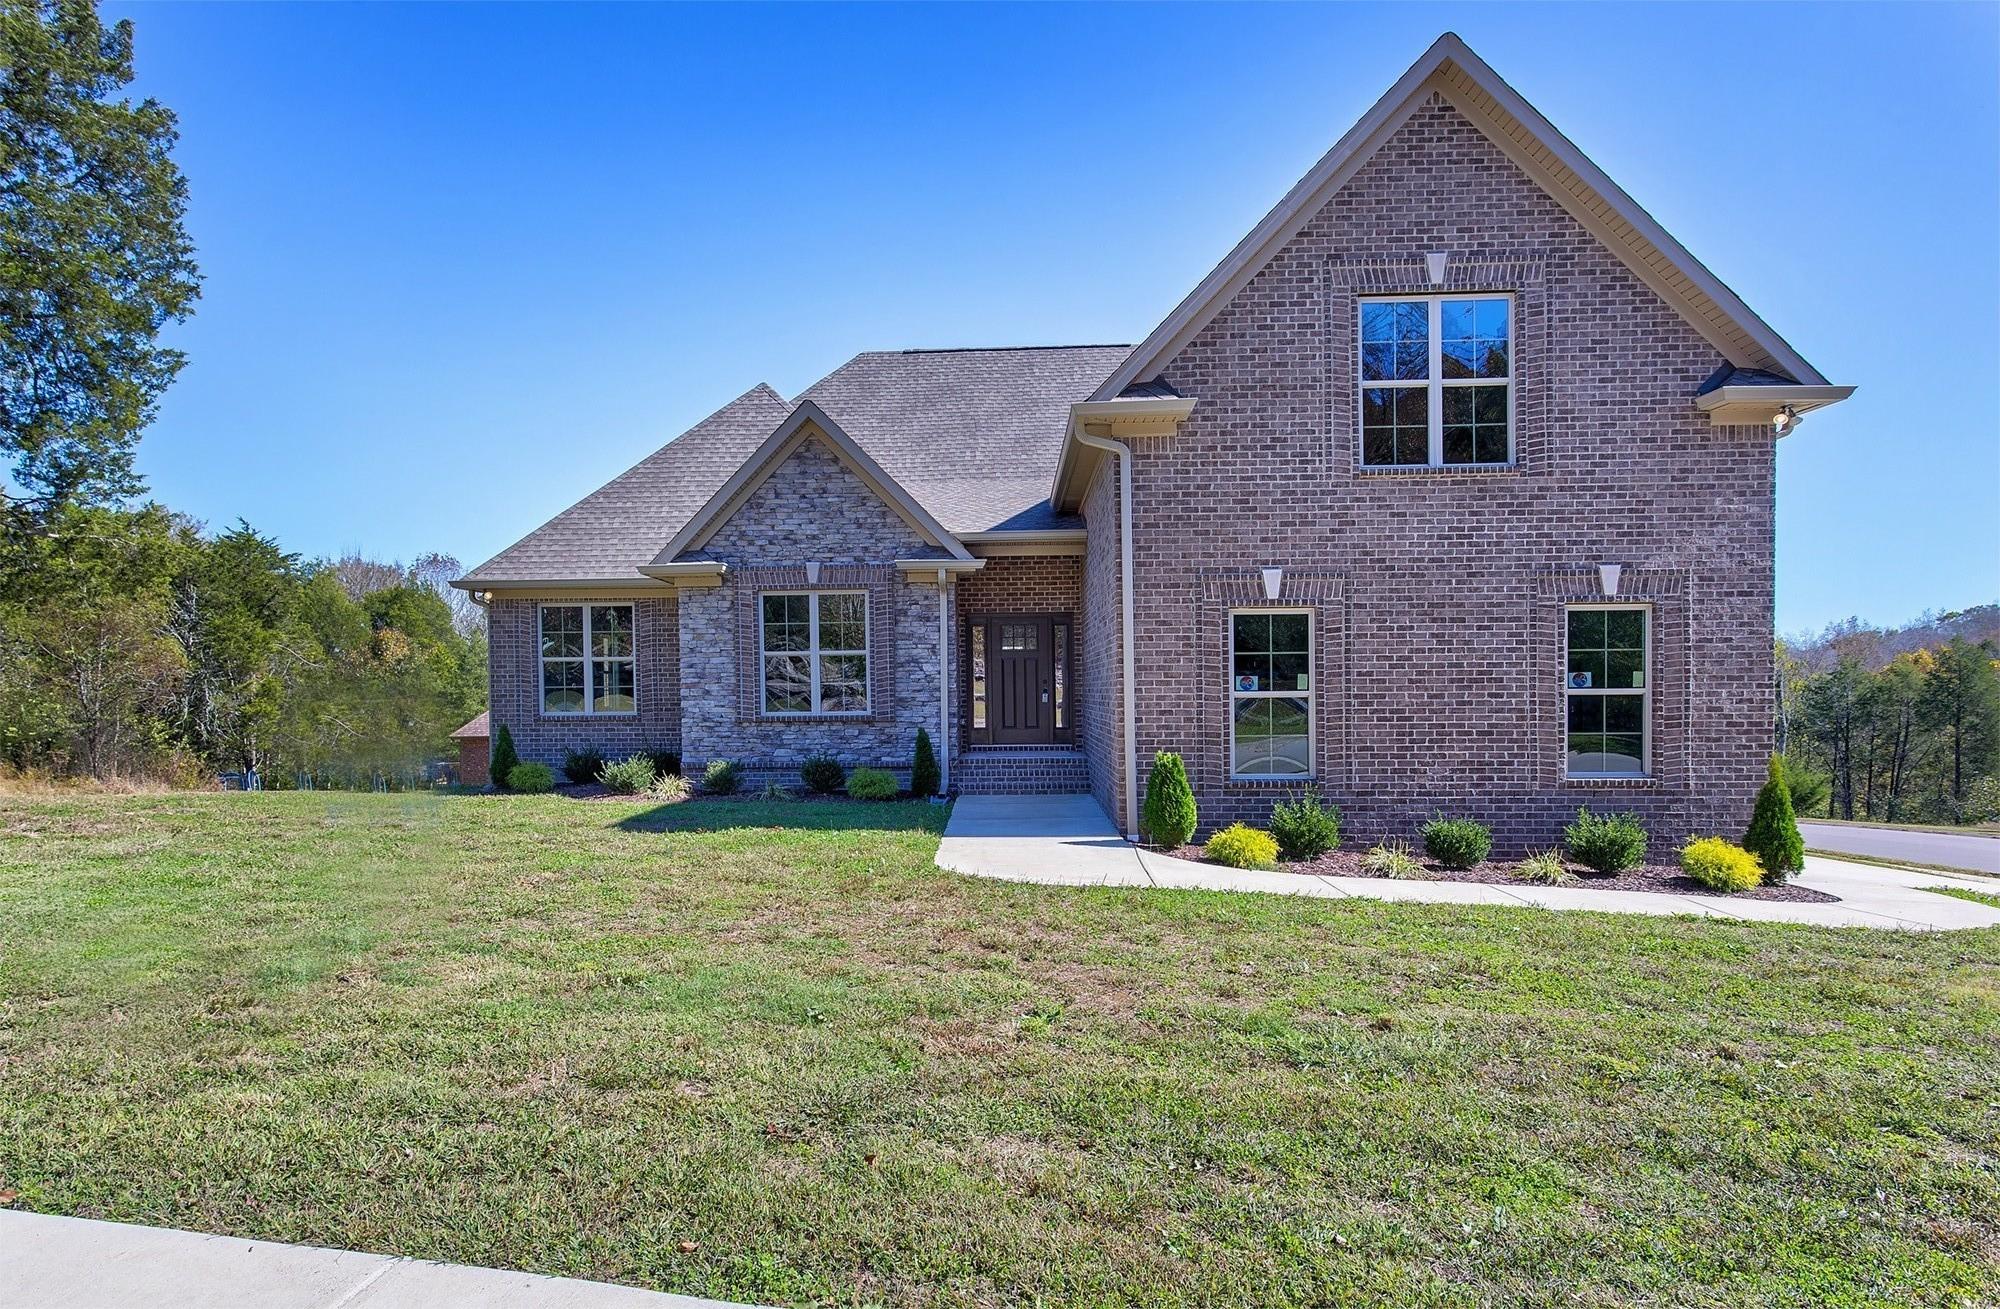 301 Cedar Hollow Ct , Lebanon, TN 37087 - Lebanon, TN real estate listing